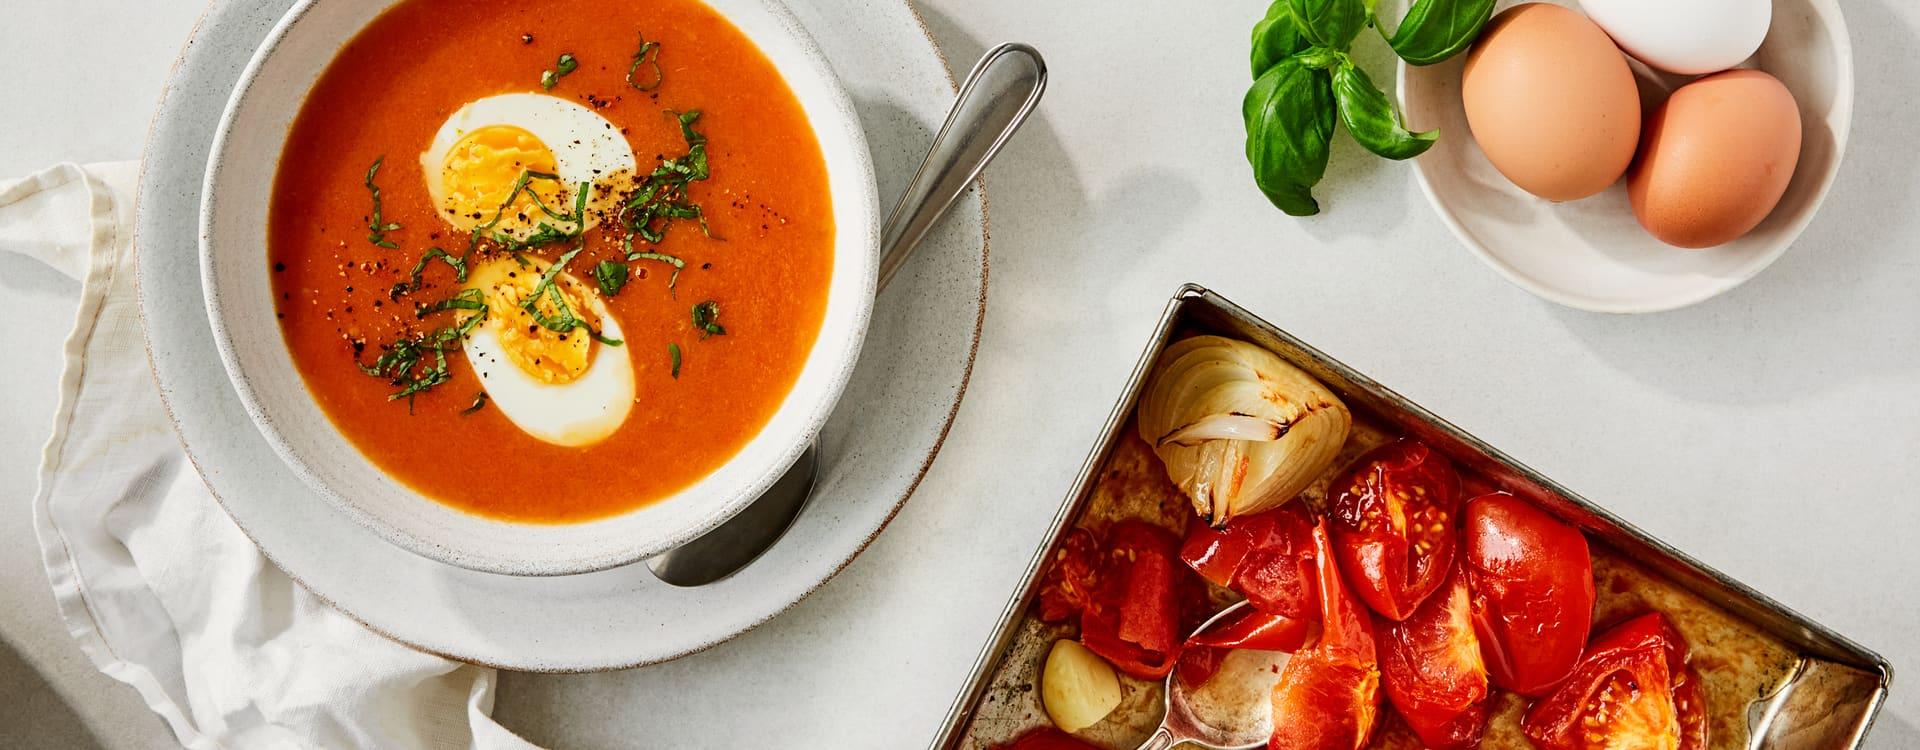 Ovnsbakt tomatsuppe